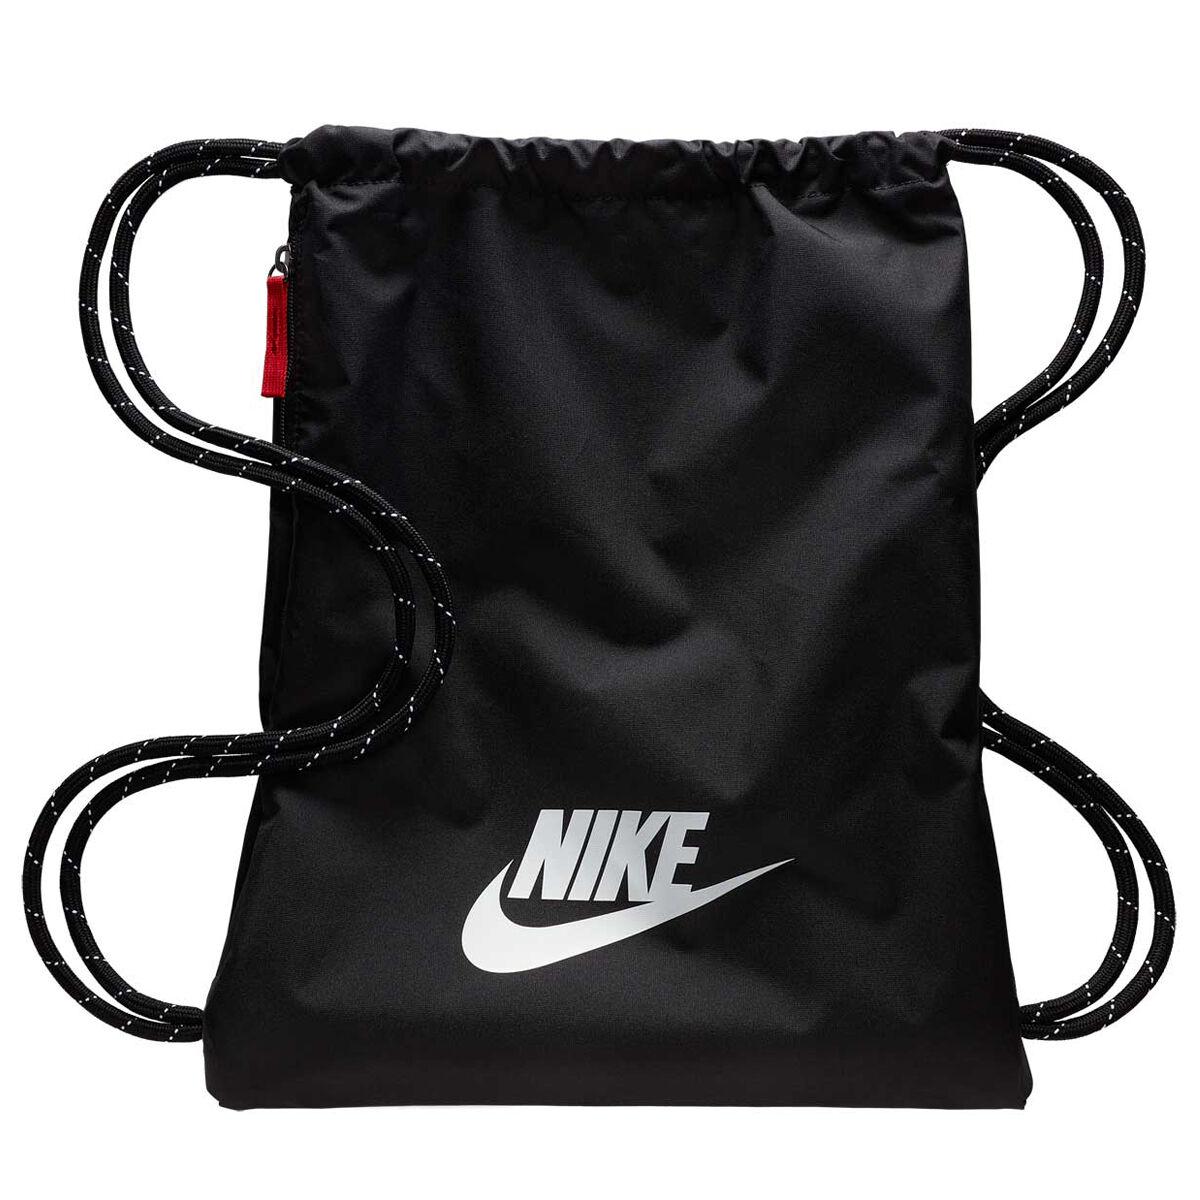 Nike Team Training Gym Drawstring Backpack   Nike bags, Nike